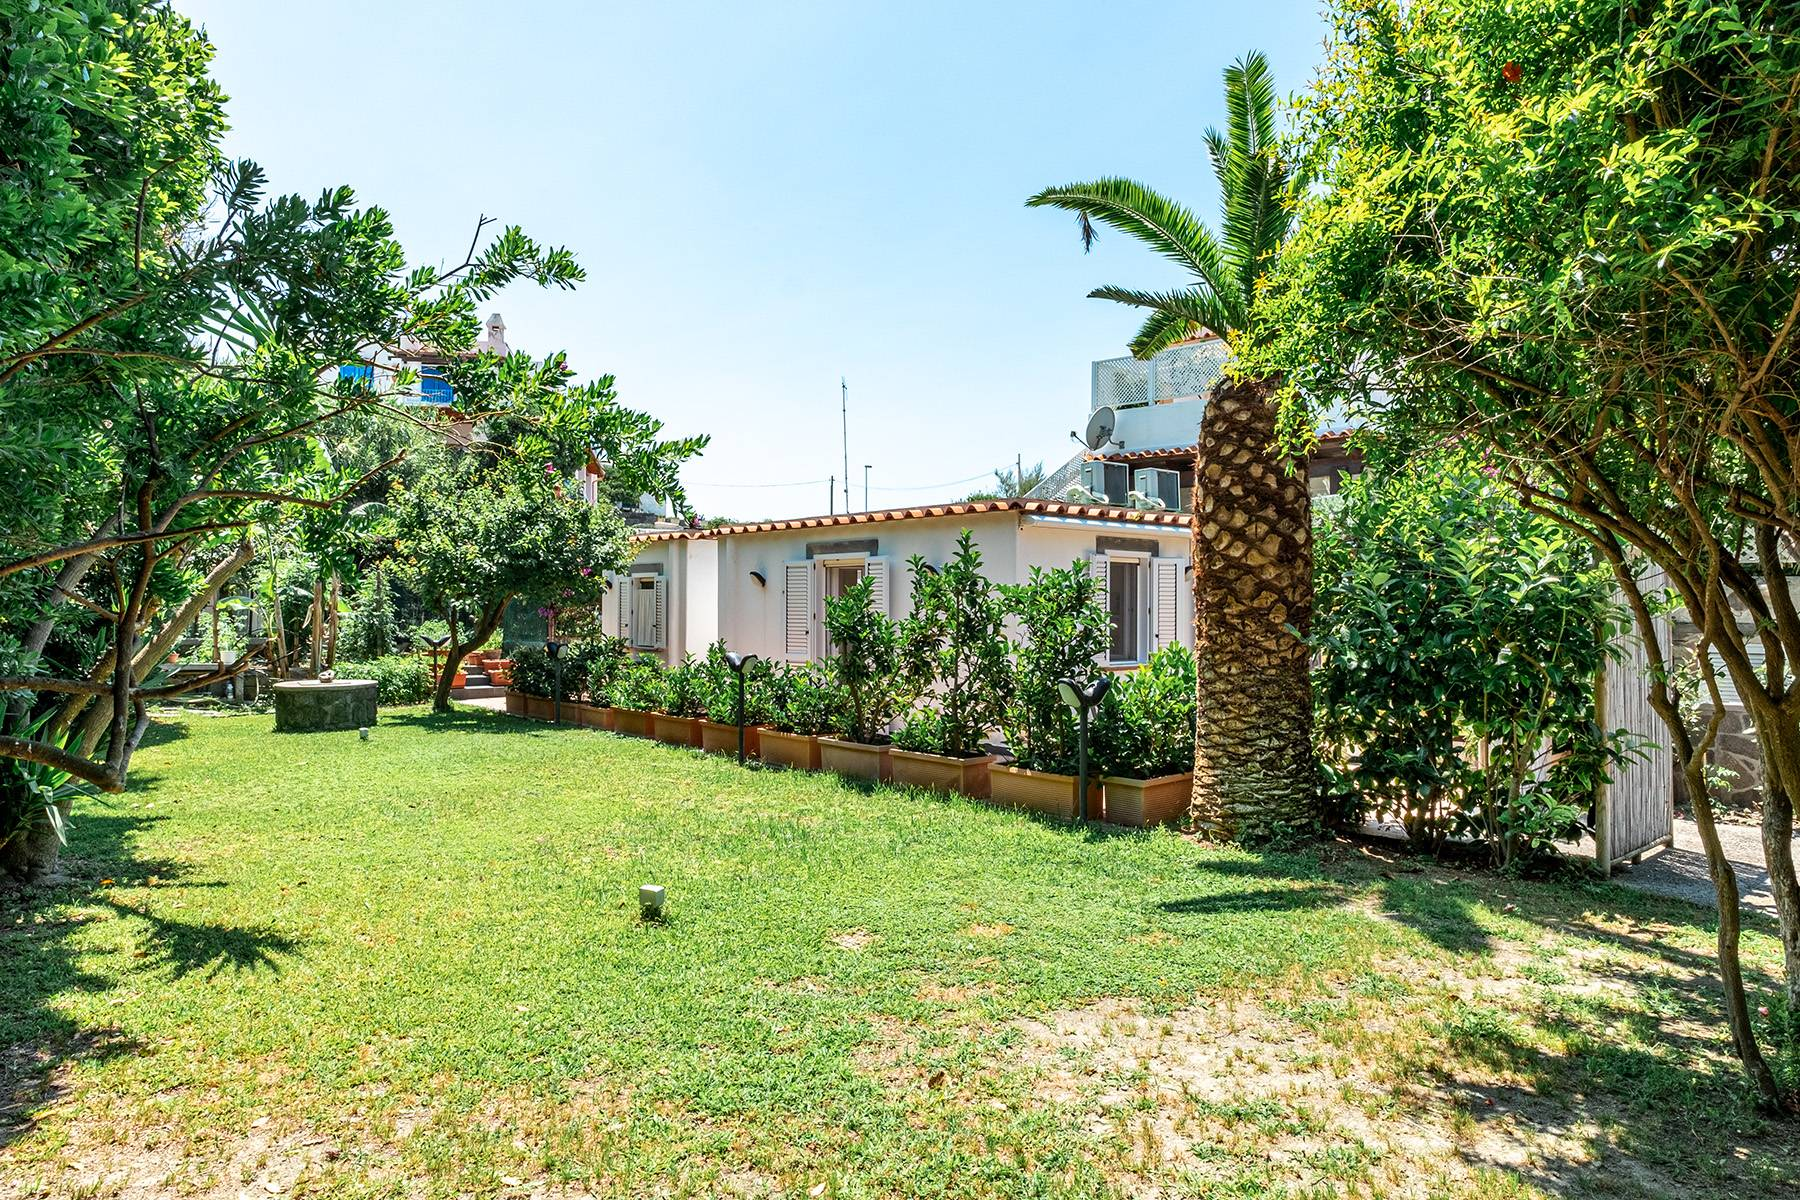 Villa in Vendita a Ischia: 5 locali, 400 mq - Foto 17